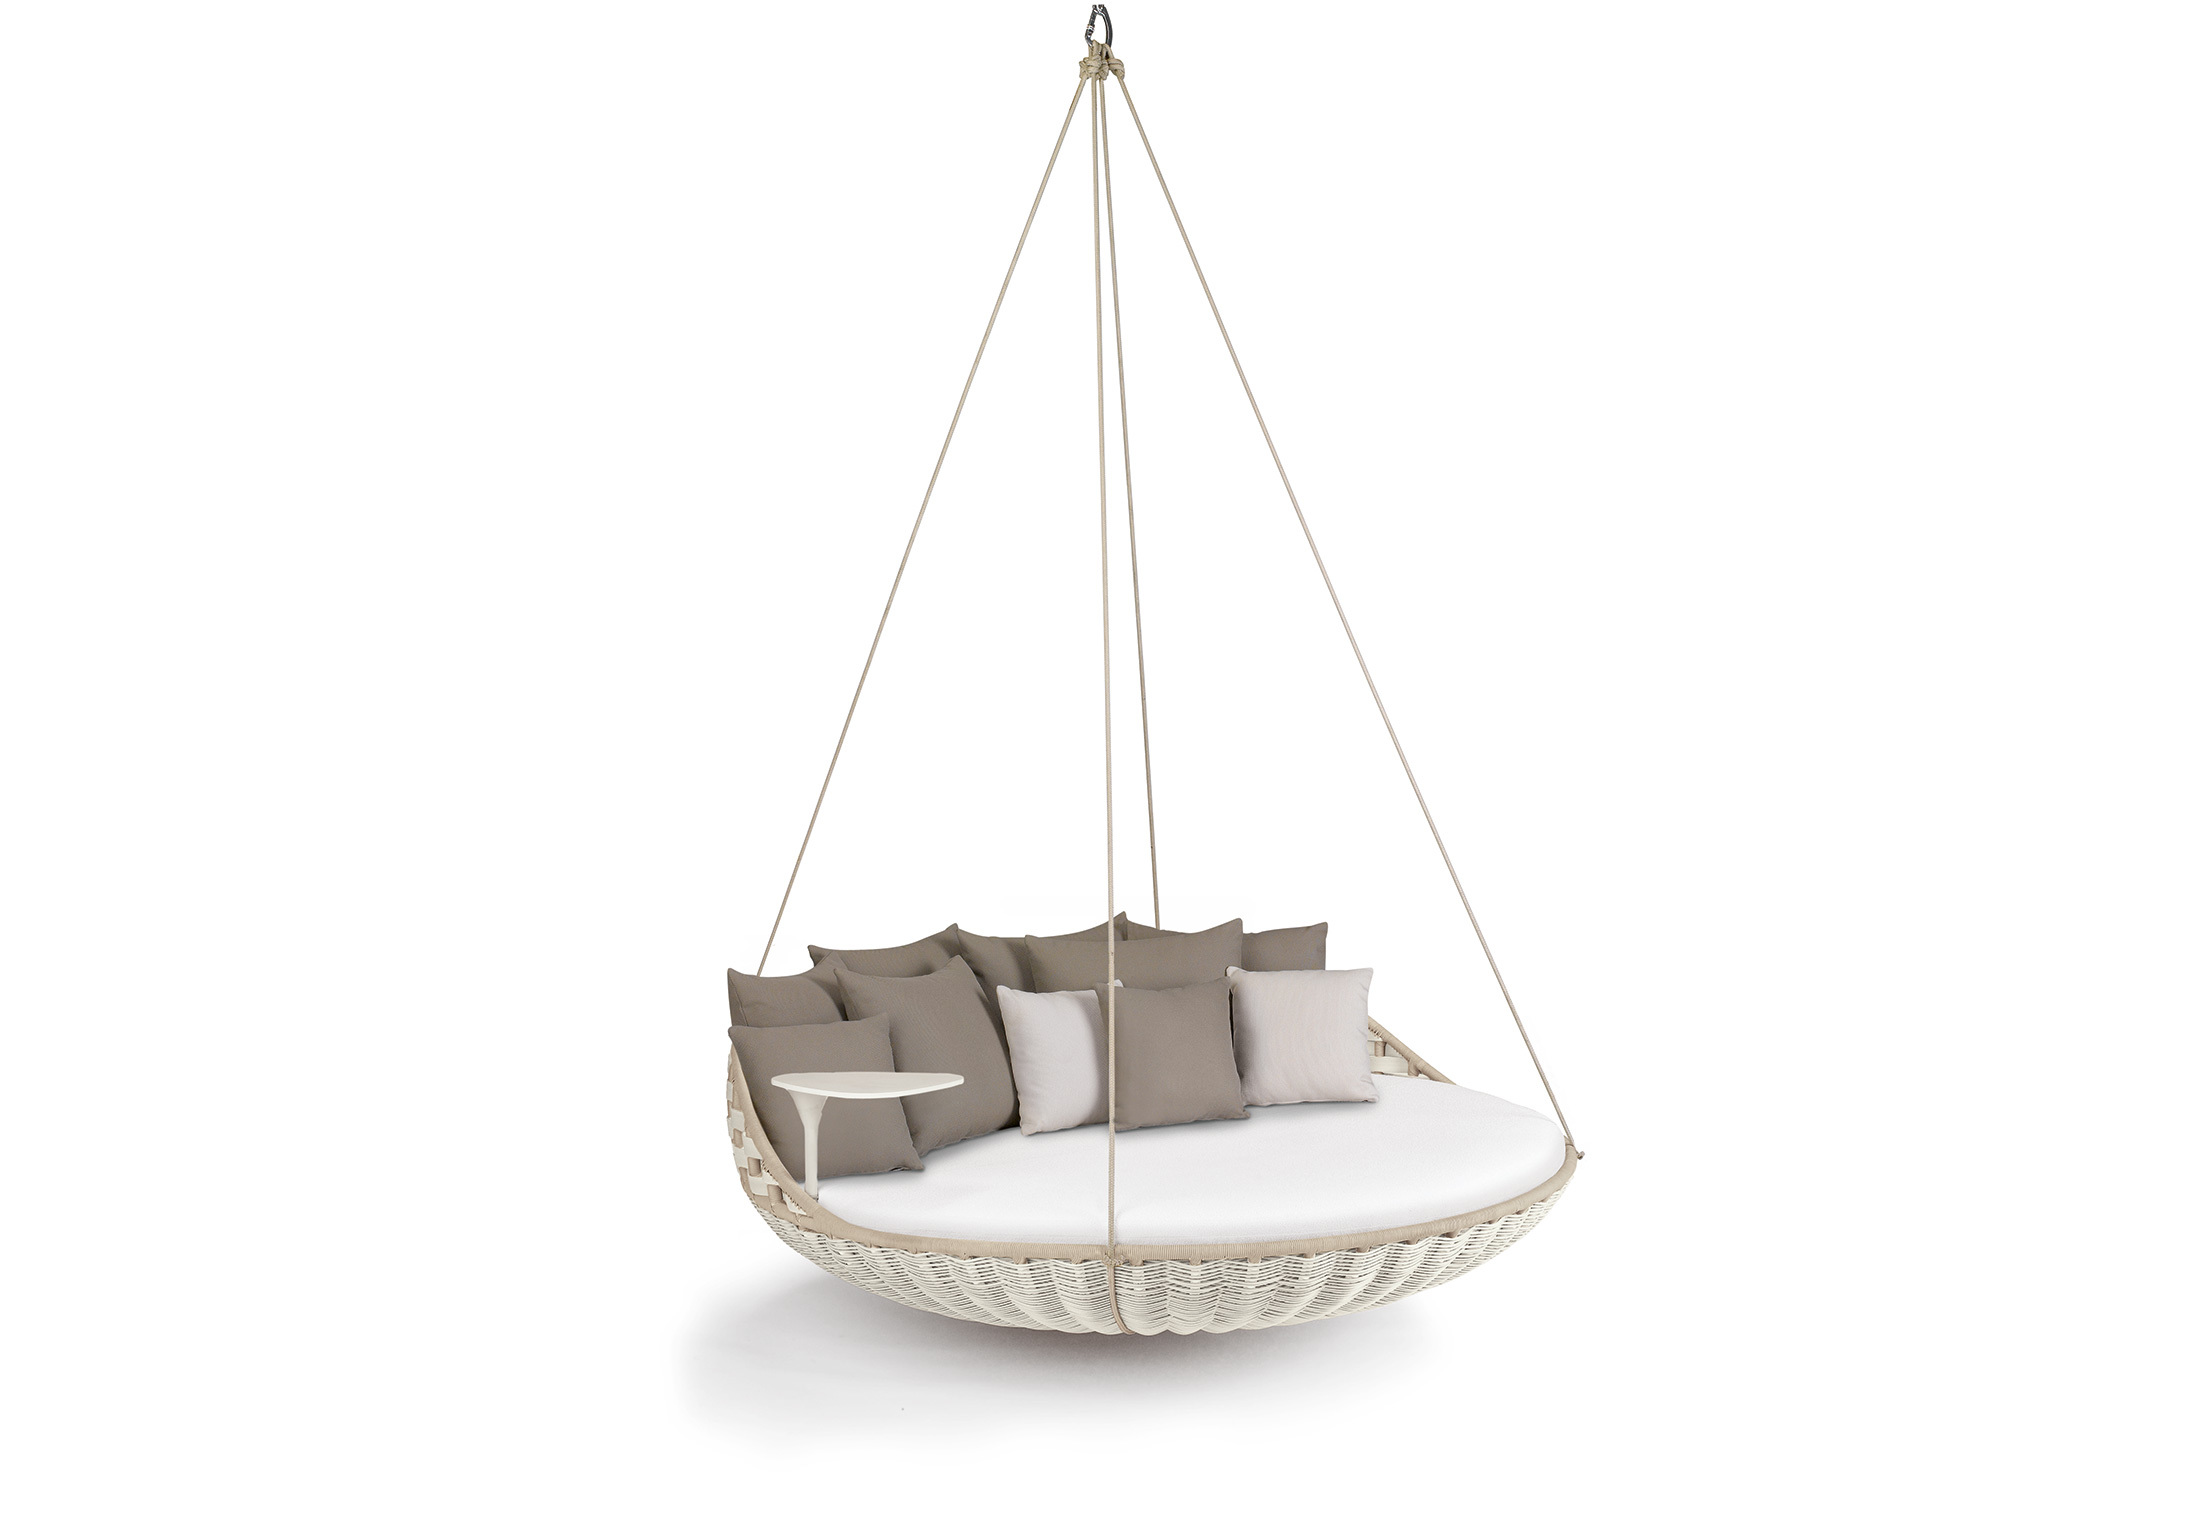 exciting dedon swingrest hanging lounger   SWINGREST hanging lounger by DEDON   STYLEPARK